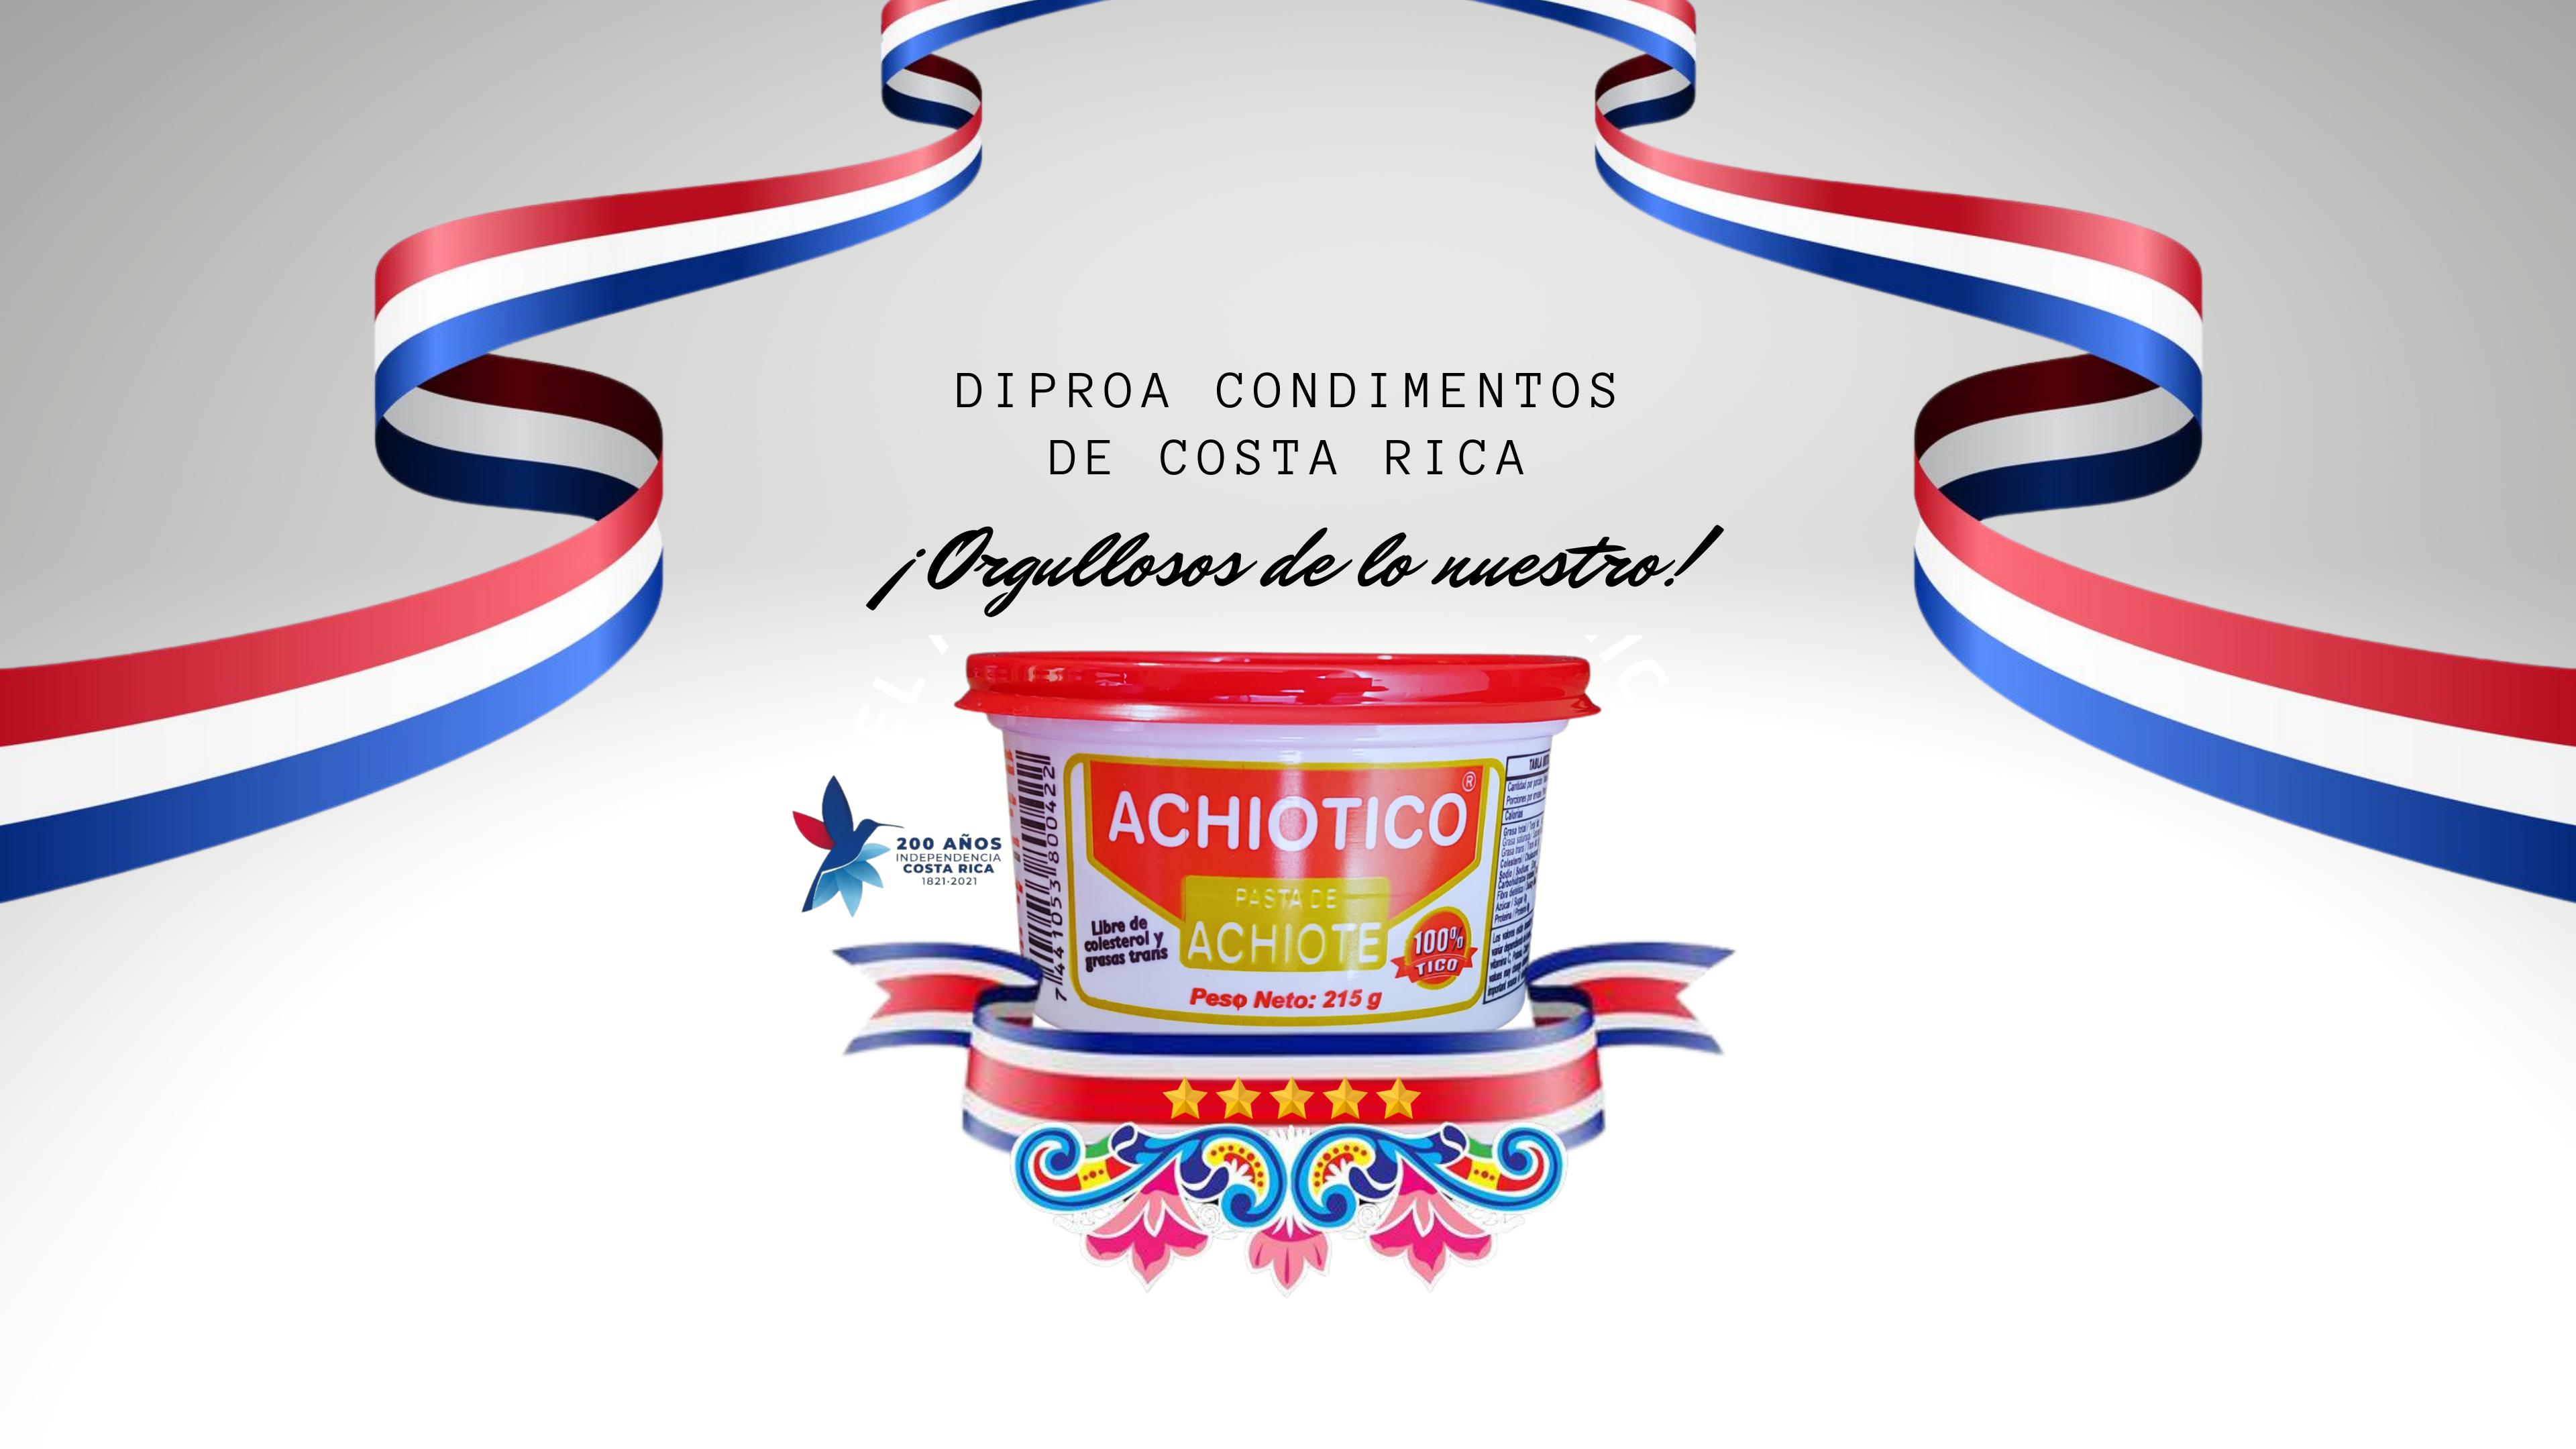 Bicentenario de Costa Rica.